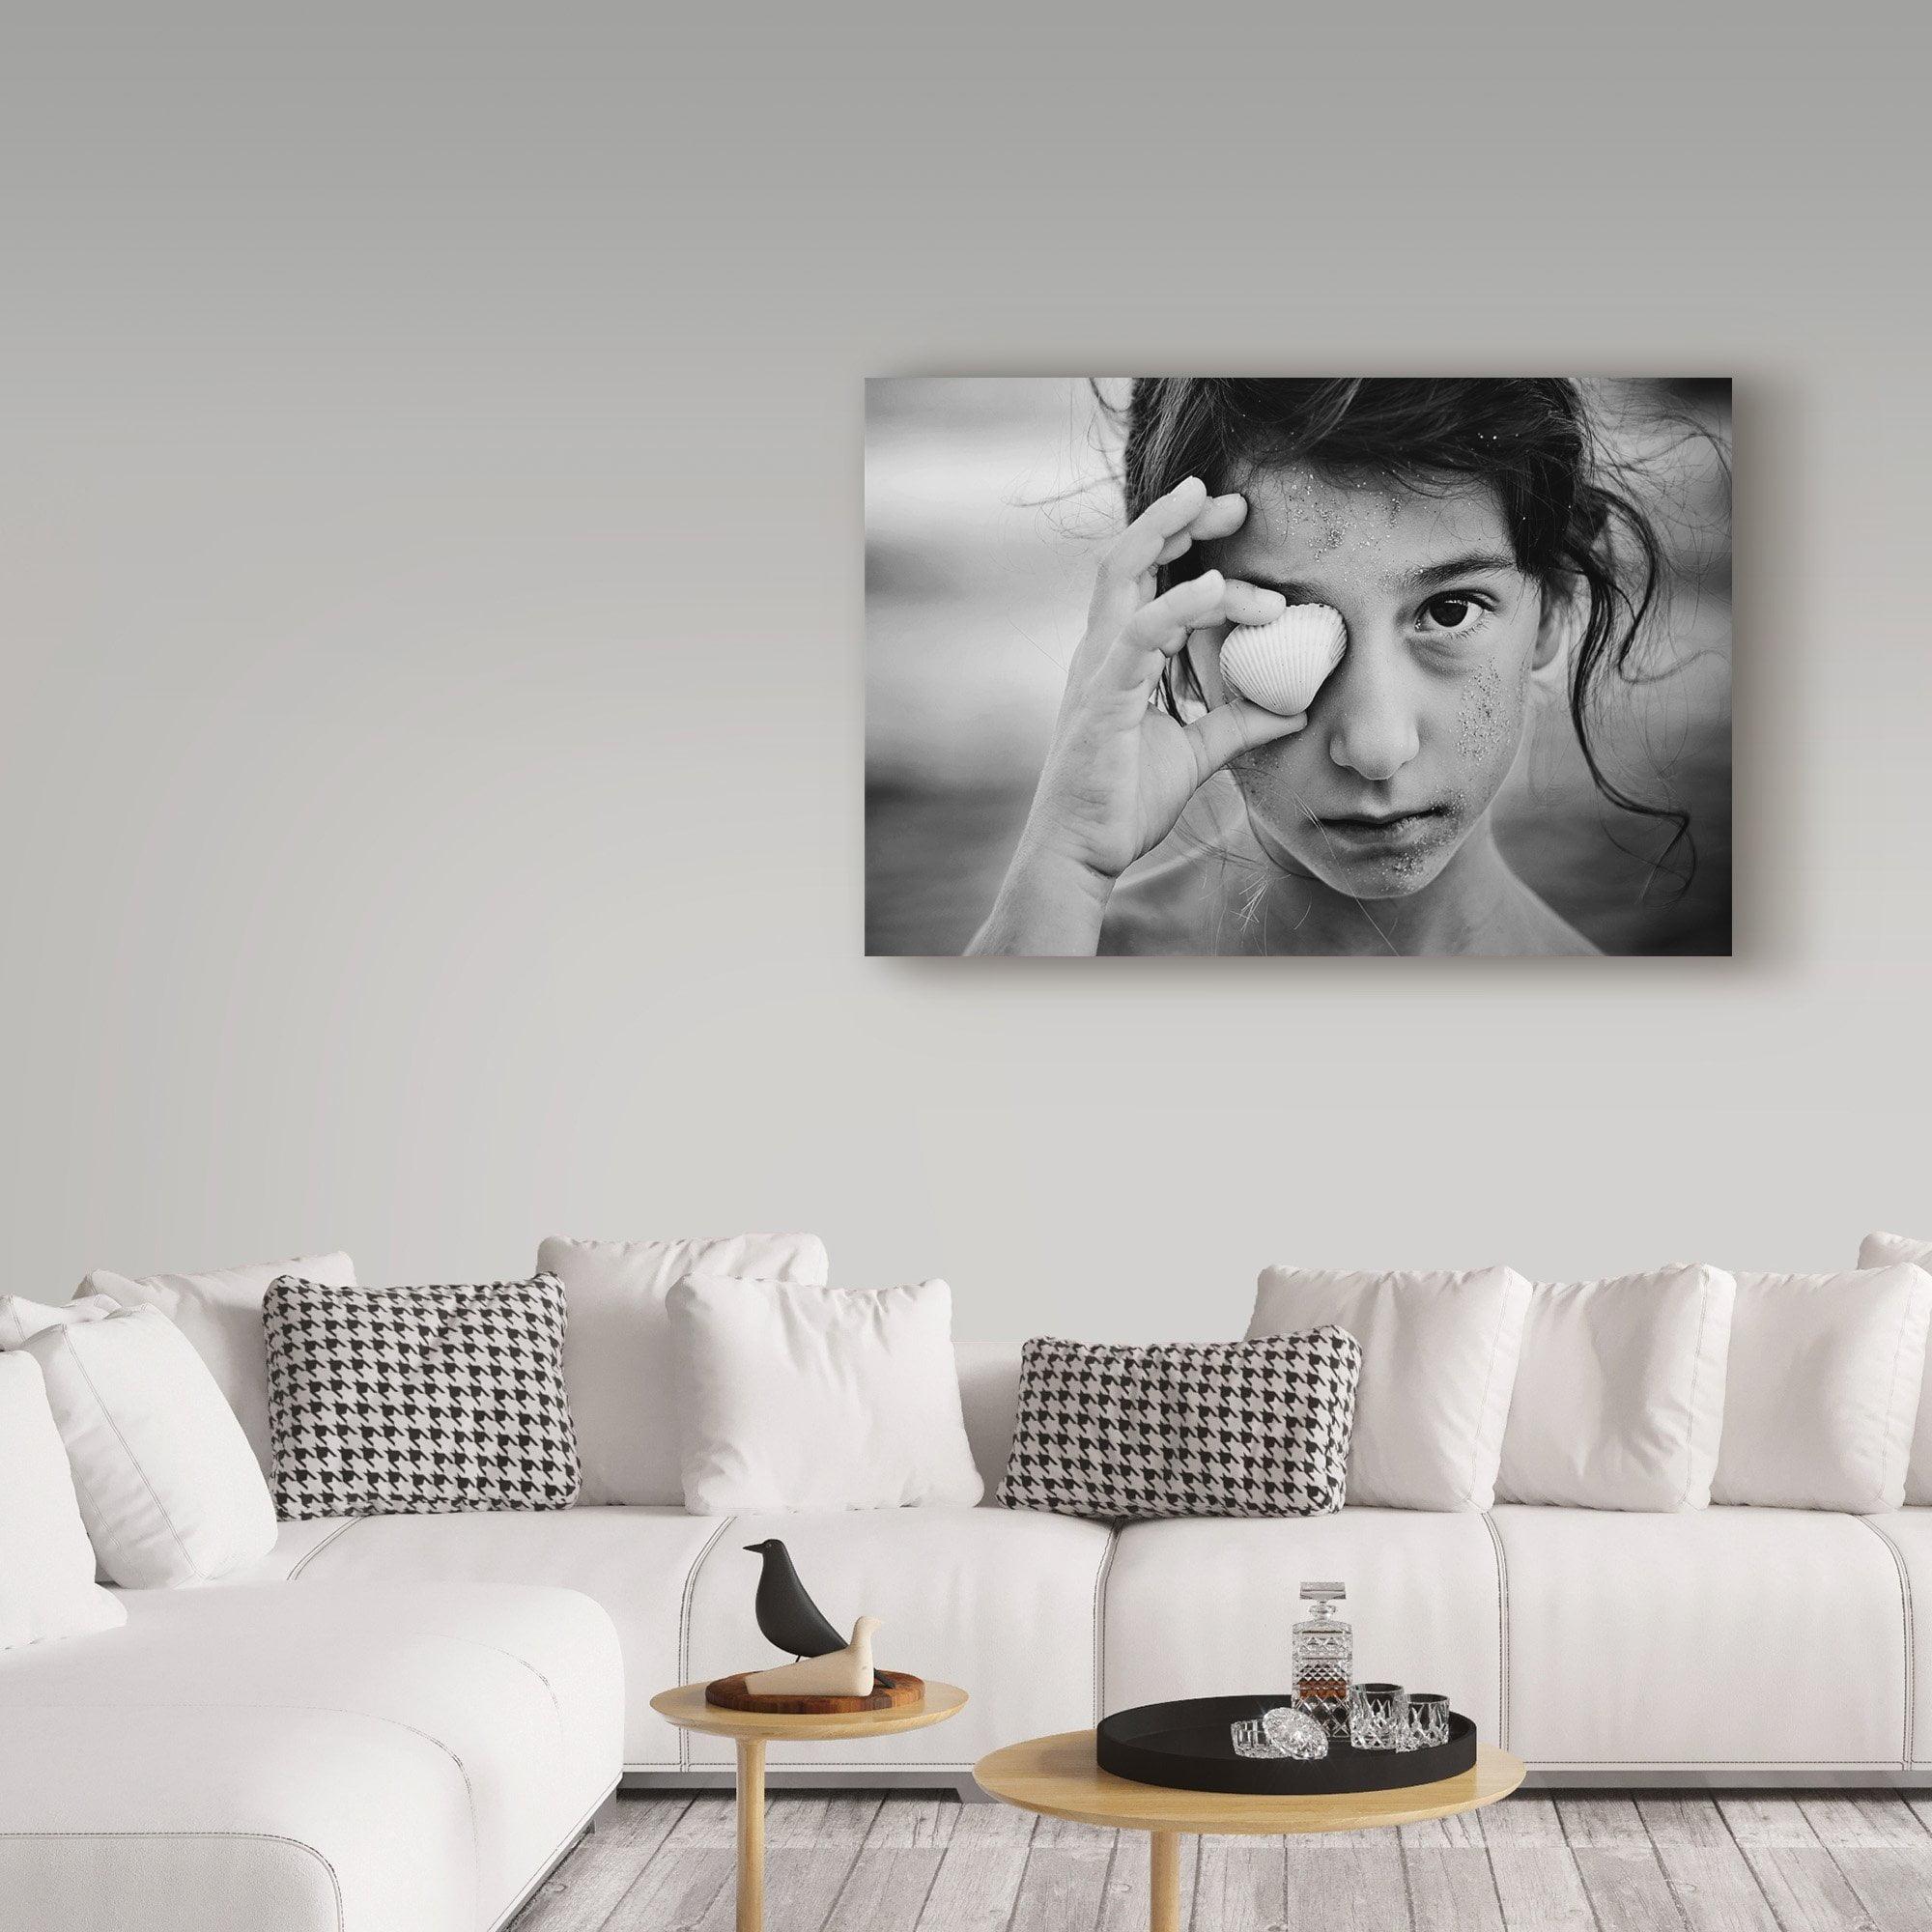 E063 Black White Woman Cool Retro Modern Framed Wall Art Large Picture Prints